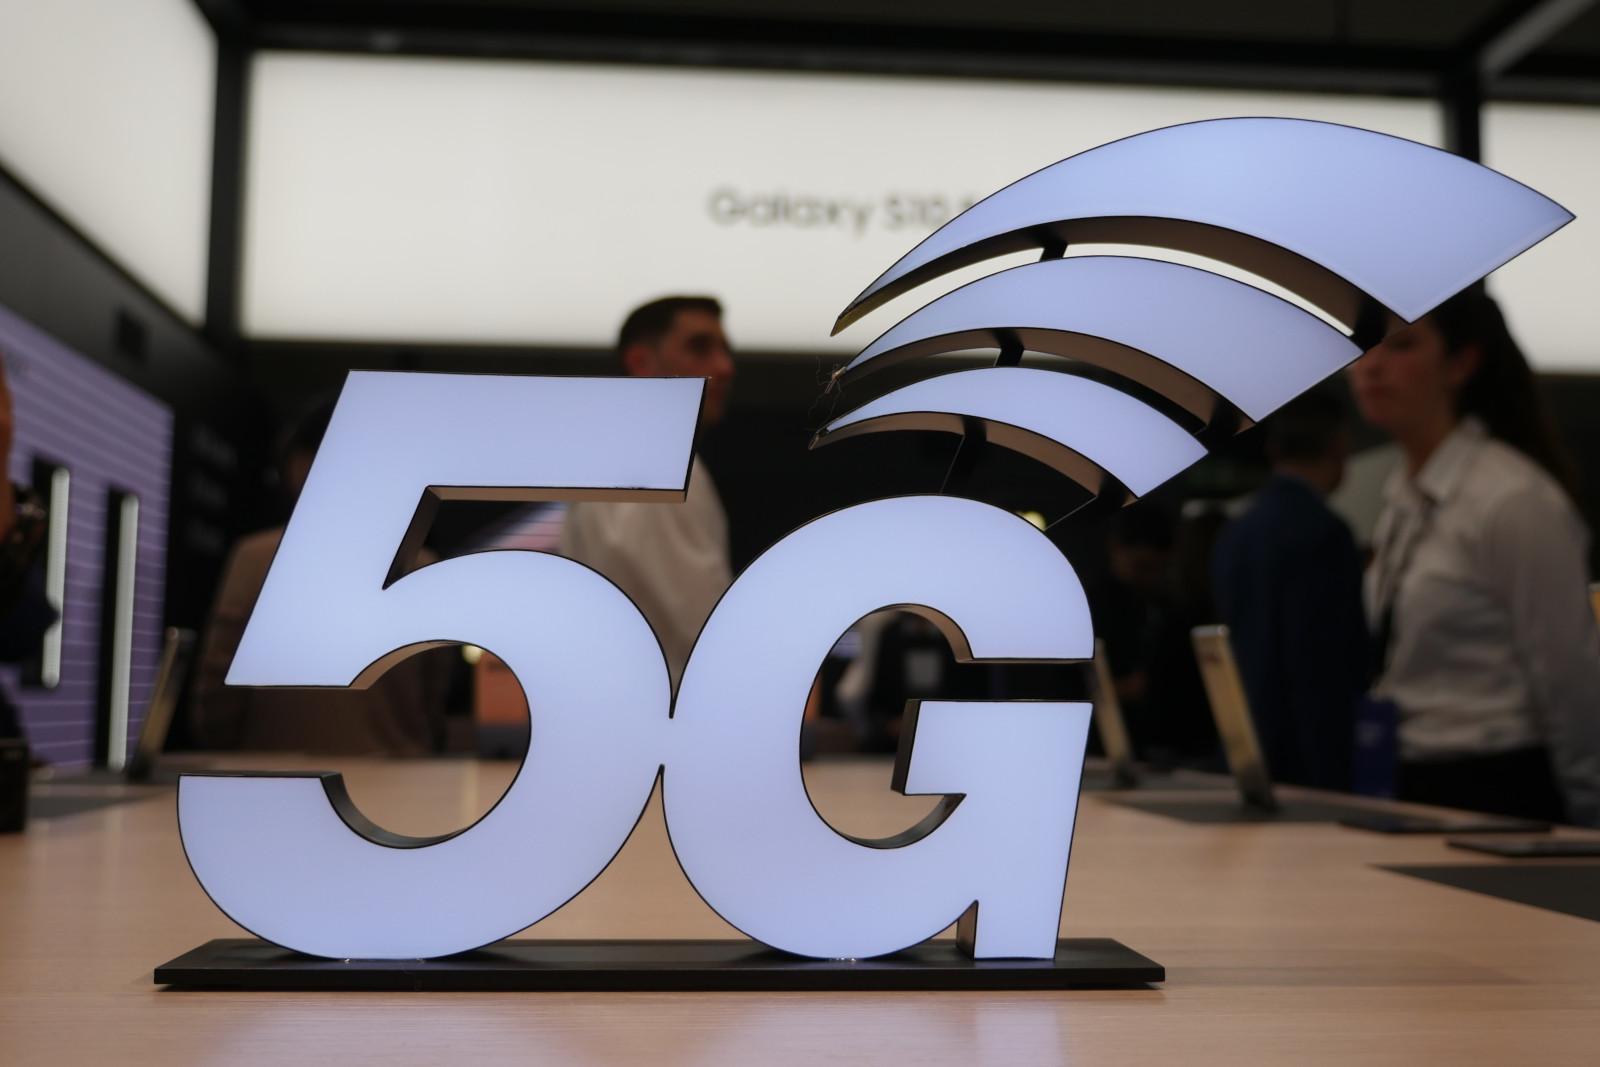 Próximos telefones 5G em 2020